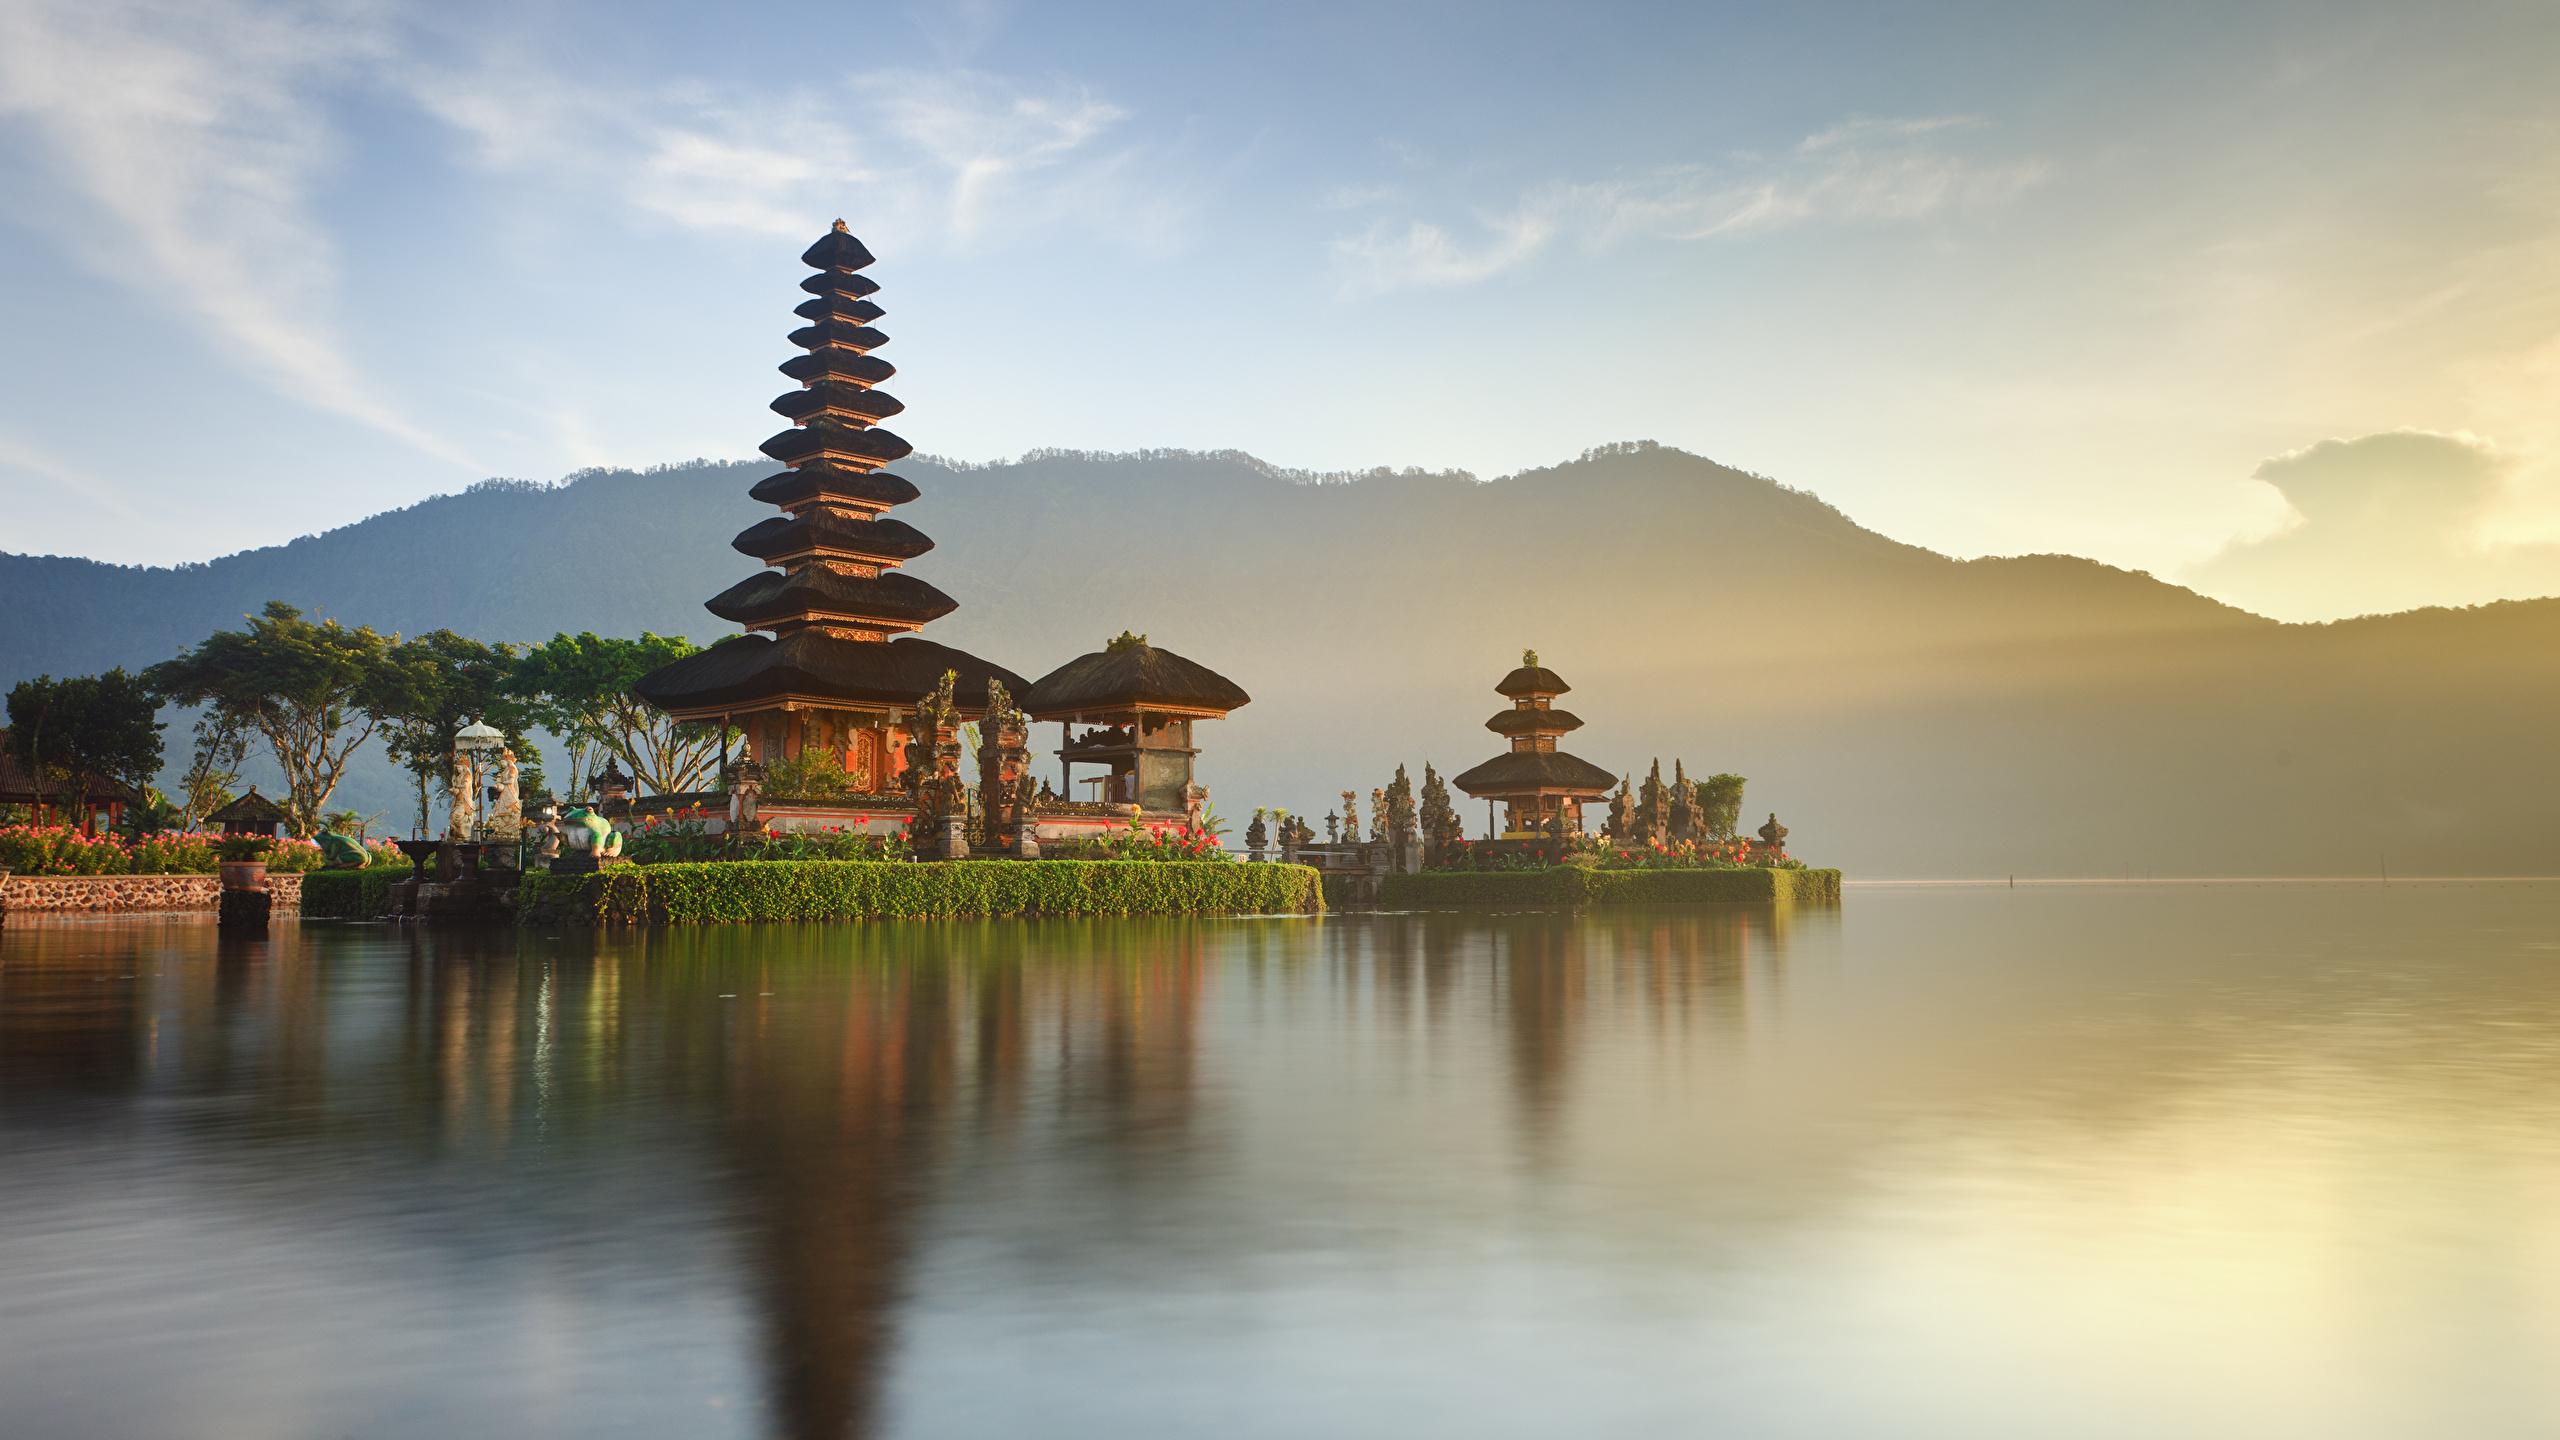 Wallpaper Indonesia Ulun Danu Beratan Temple Bali Bay 2560x1440